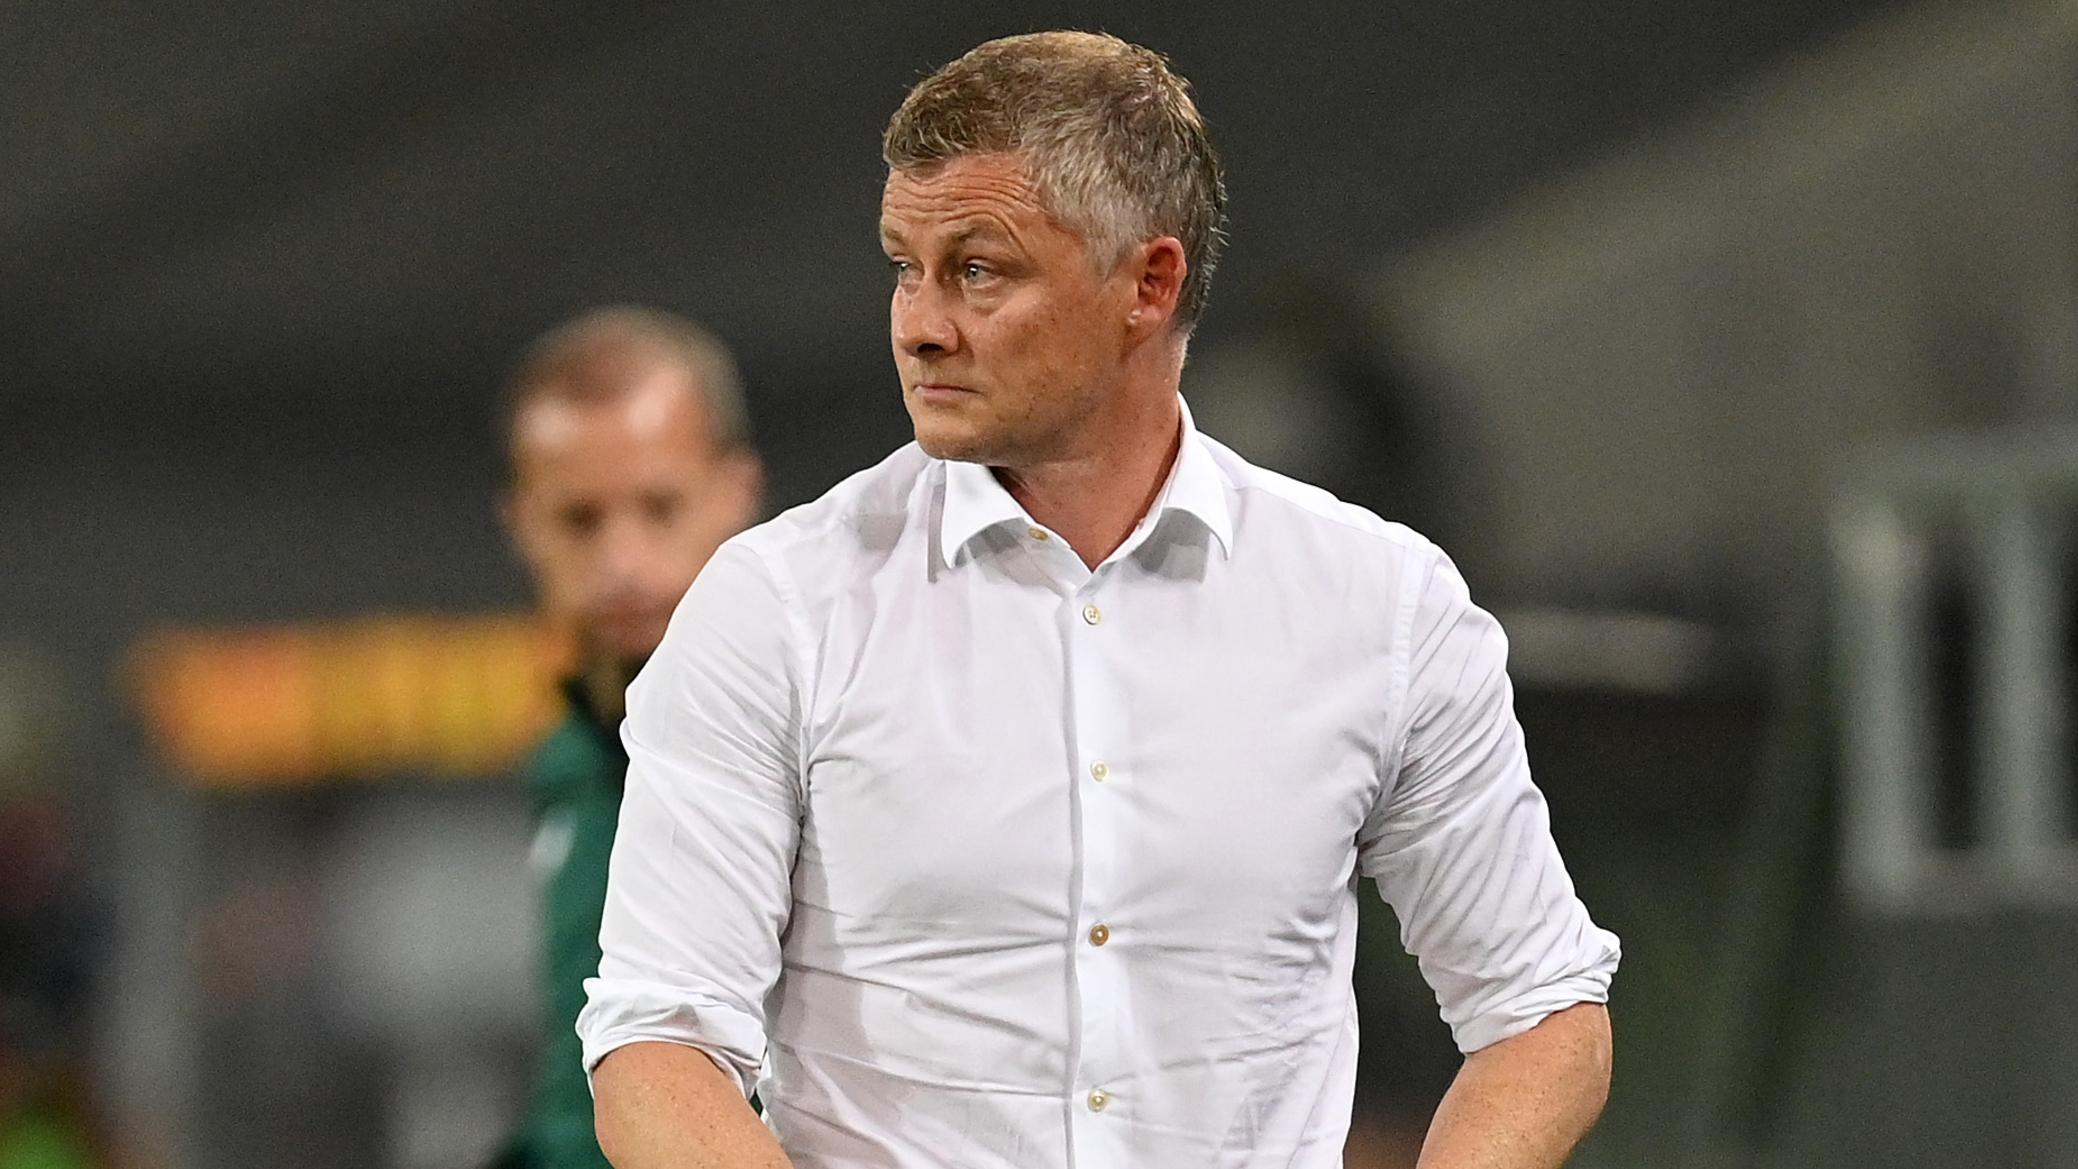 Manchester United secure 1-0 win over Copenhagen